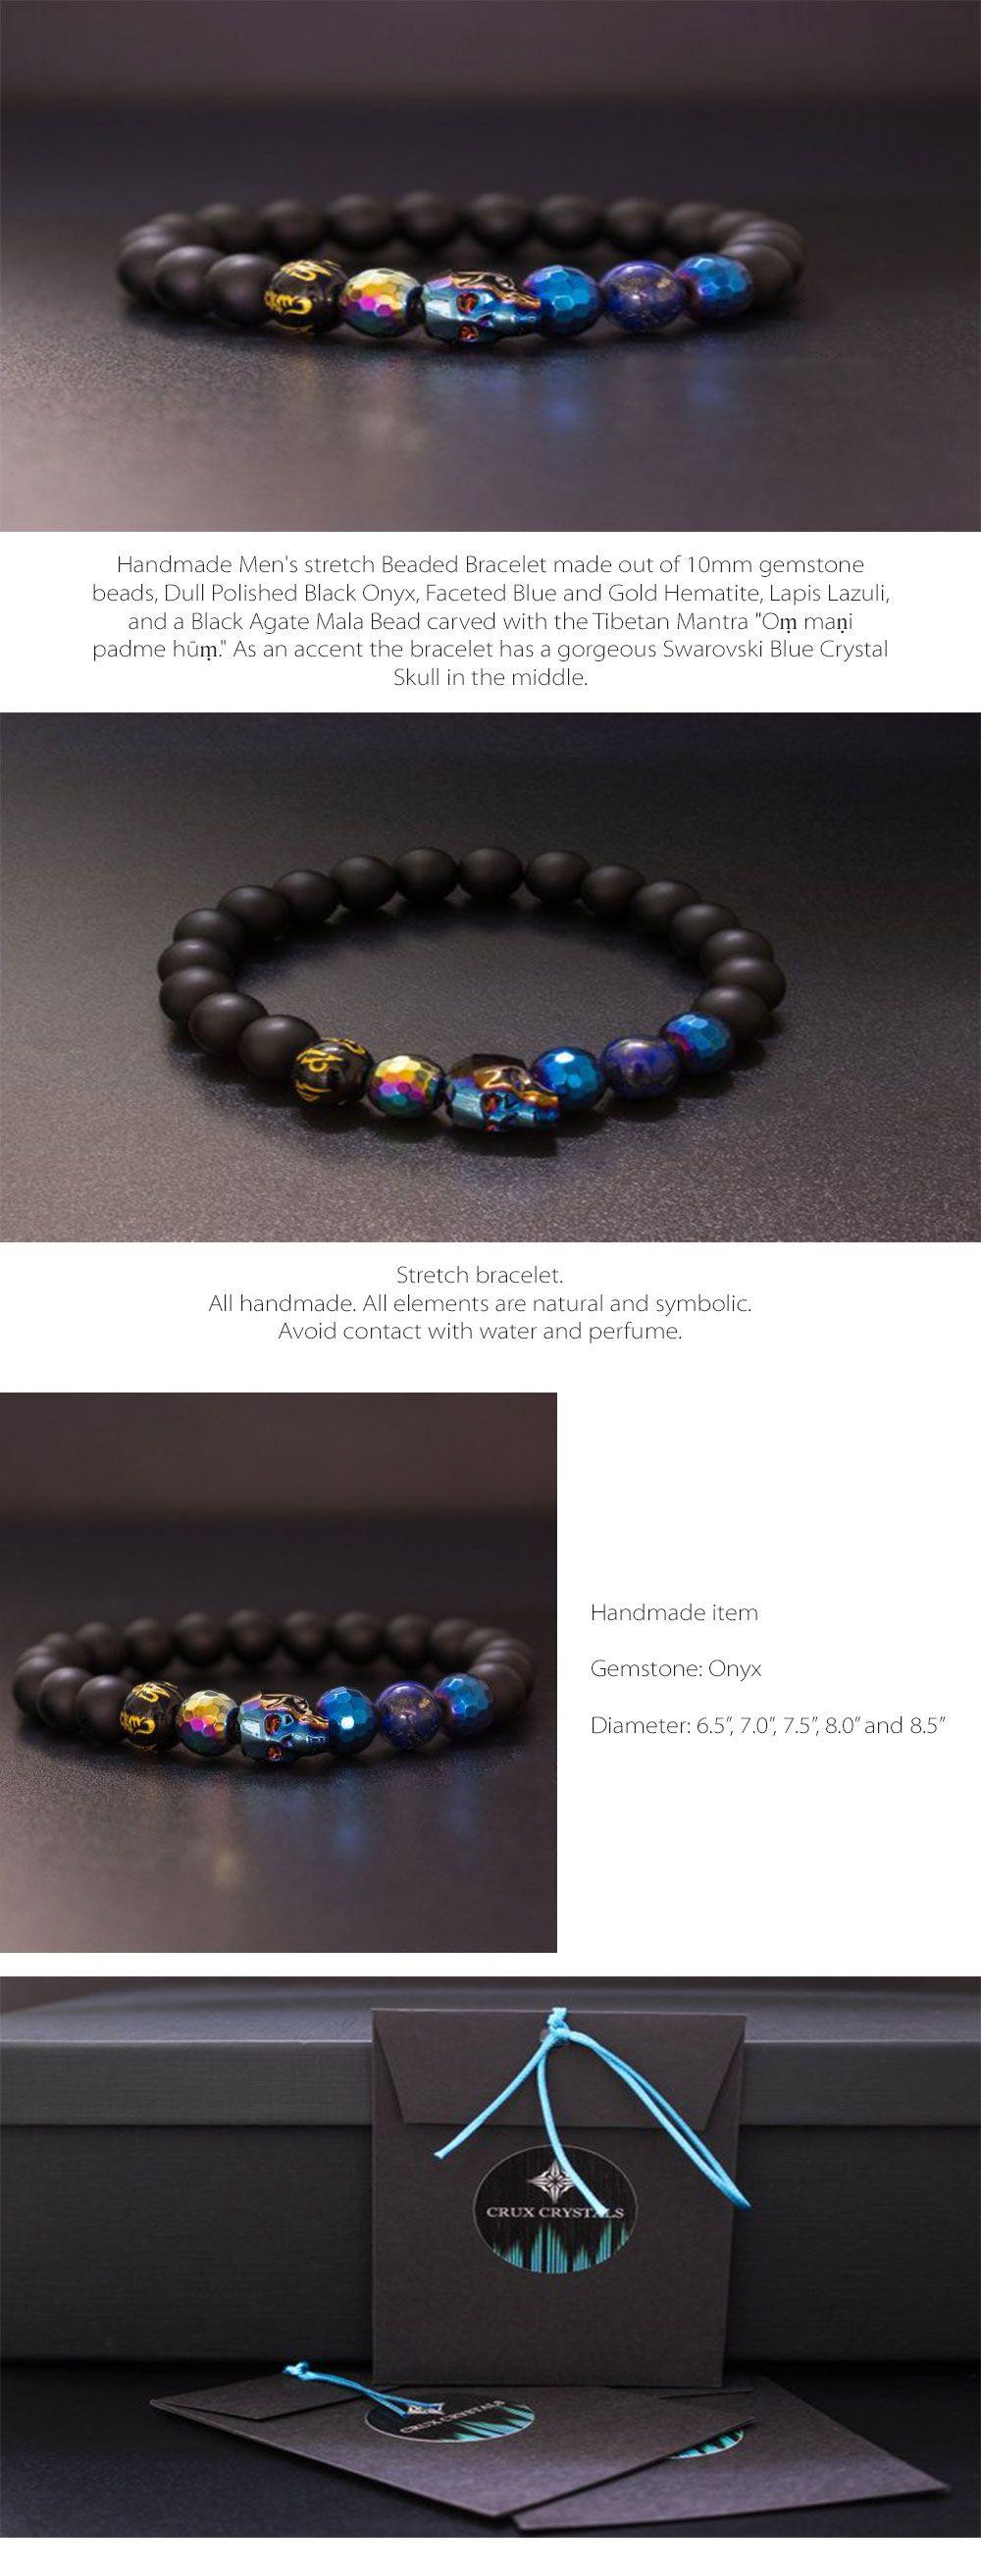 dd327b51d97c Men s Blue Swarovski Crystal Skull Beaded Bracelet Gemstone Black Onyx